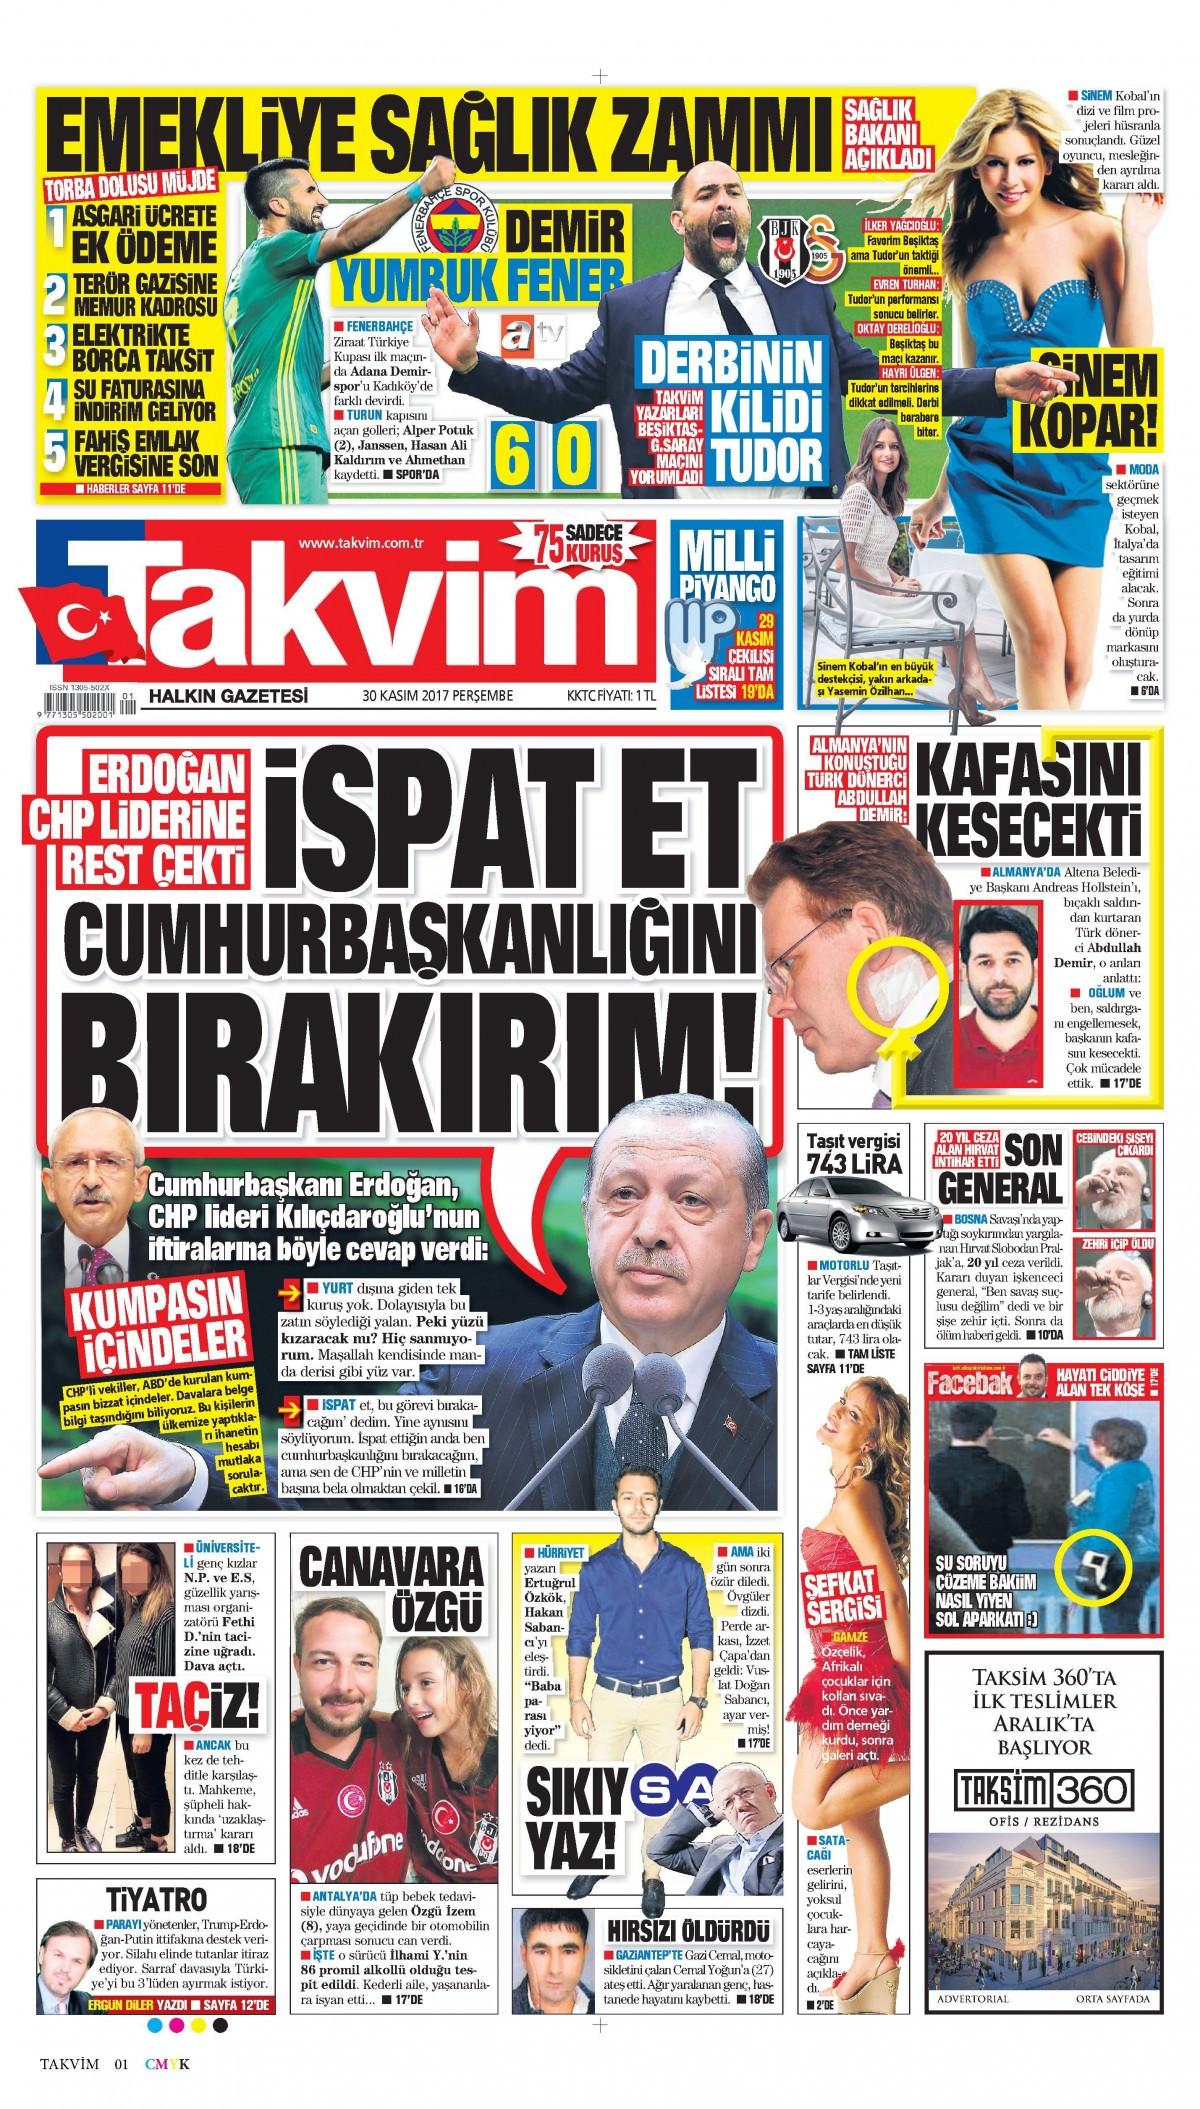 Gazeteler bugün hangi manşeti attı 9